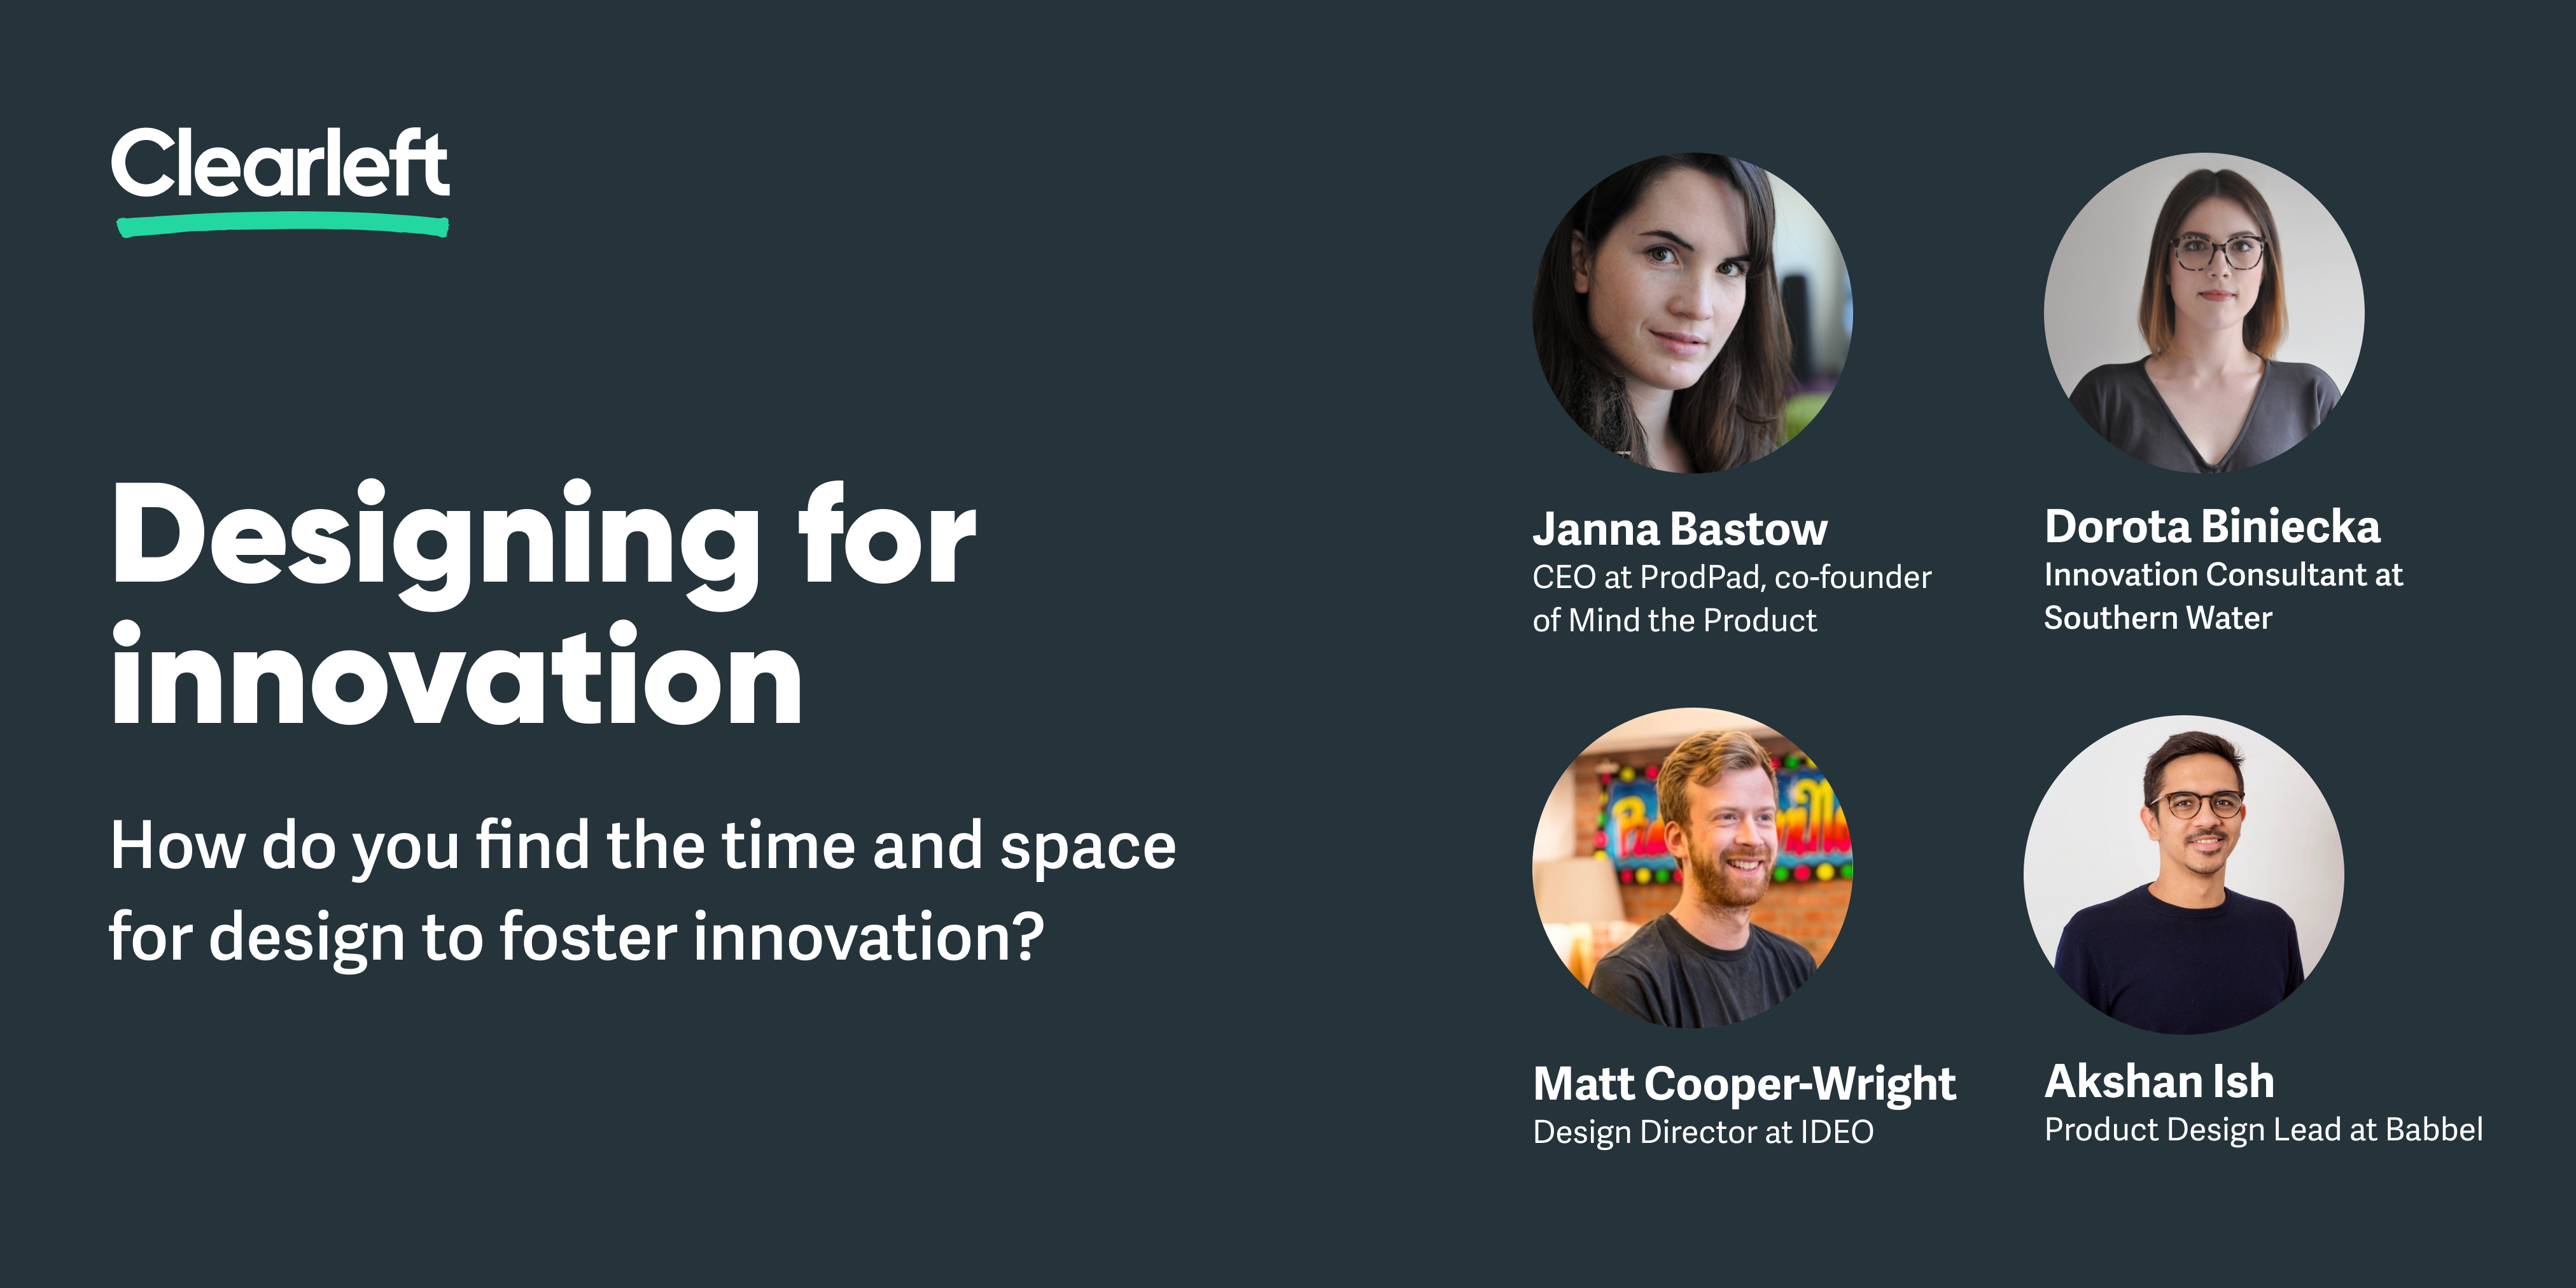 Designing for innovation panellists